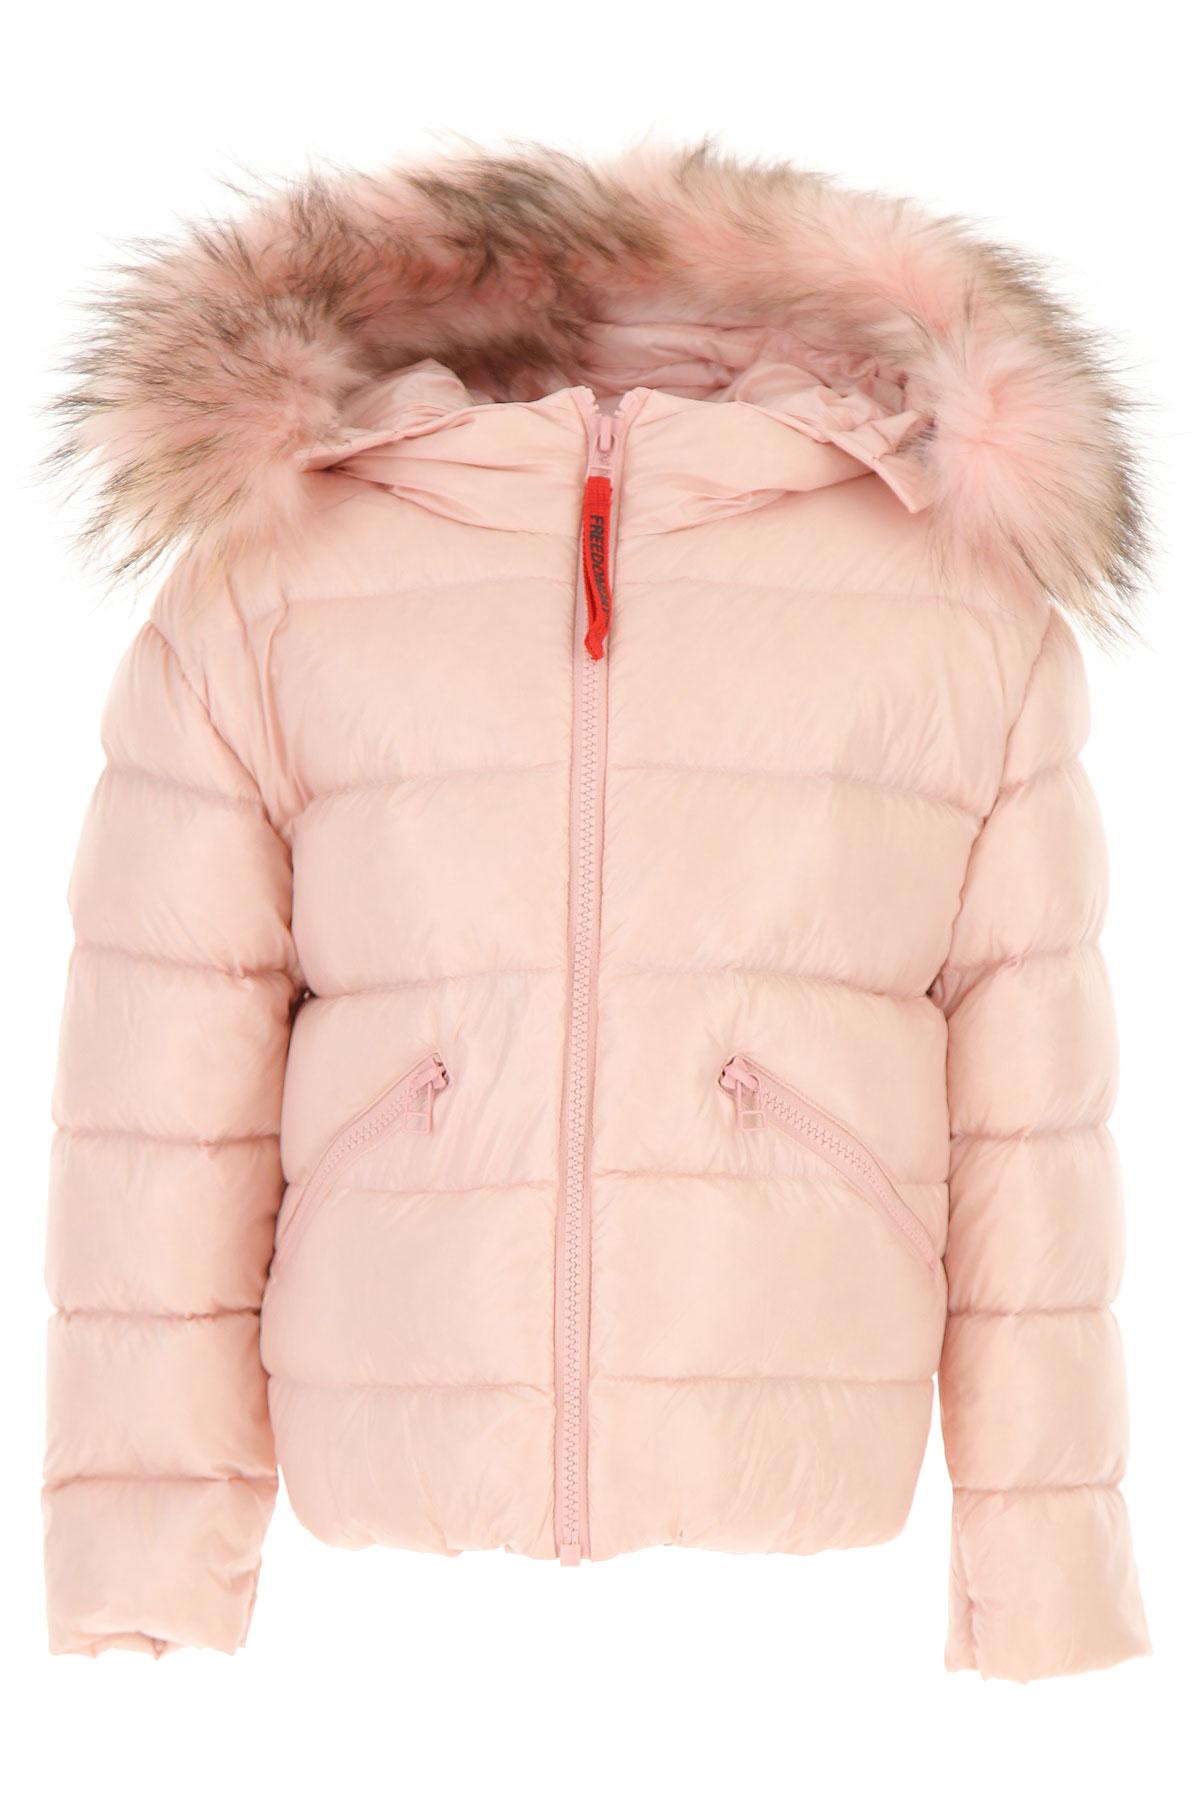 Image of Freedomday Girls Down Jacket for Kids, Puffer Ski Jacket, Pink, Nylon, 2017, 10Y 4Y 6Y 8Y